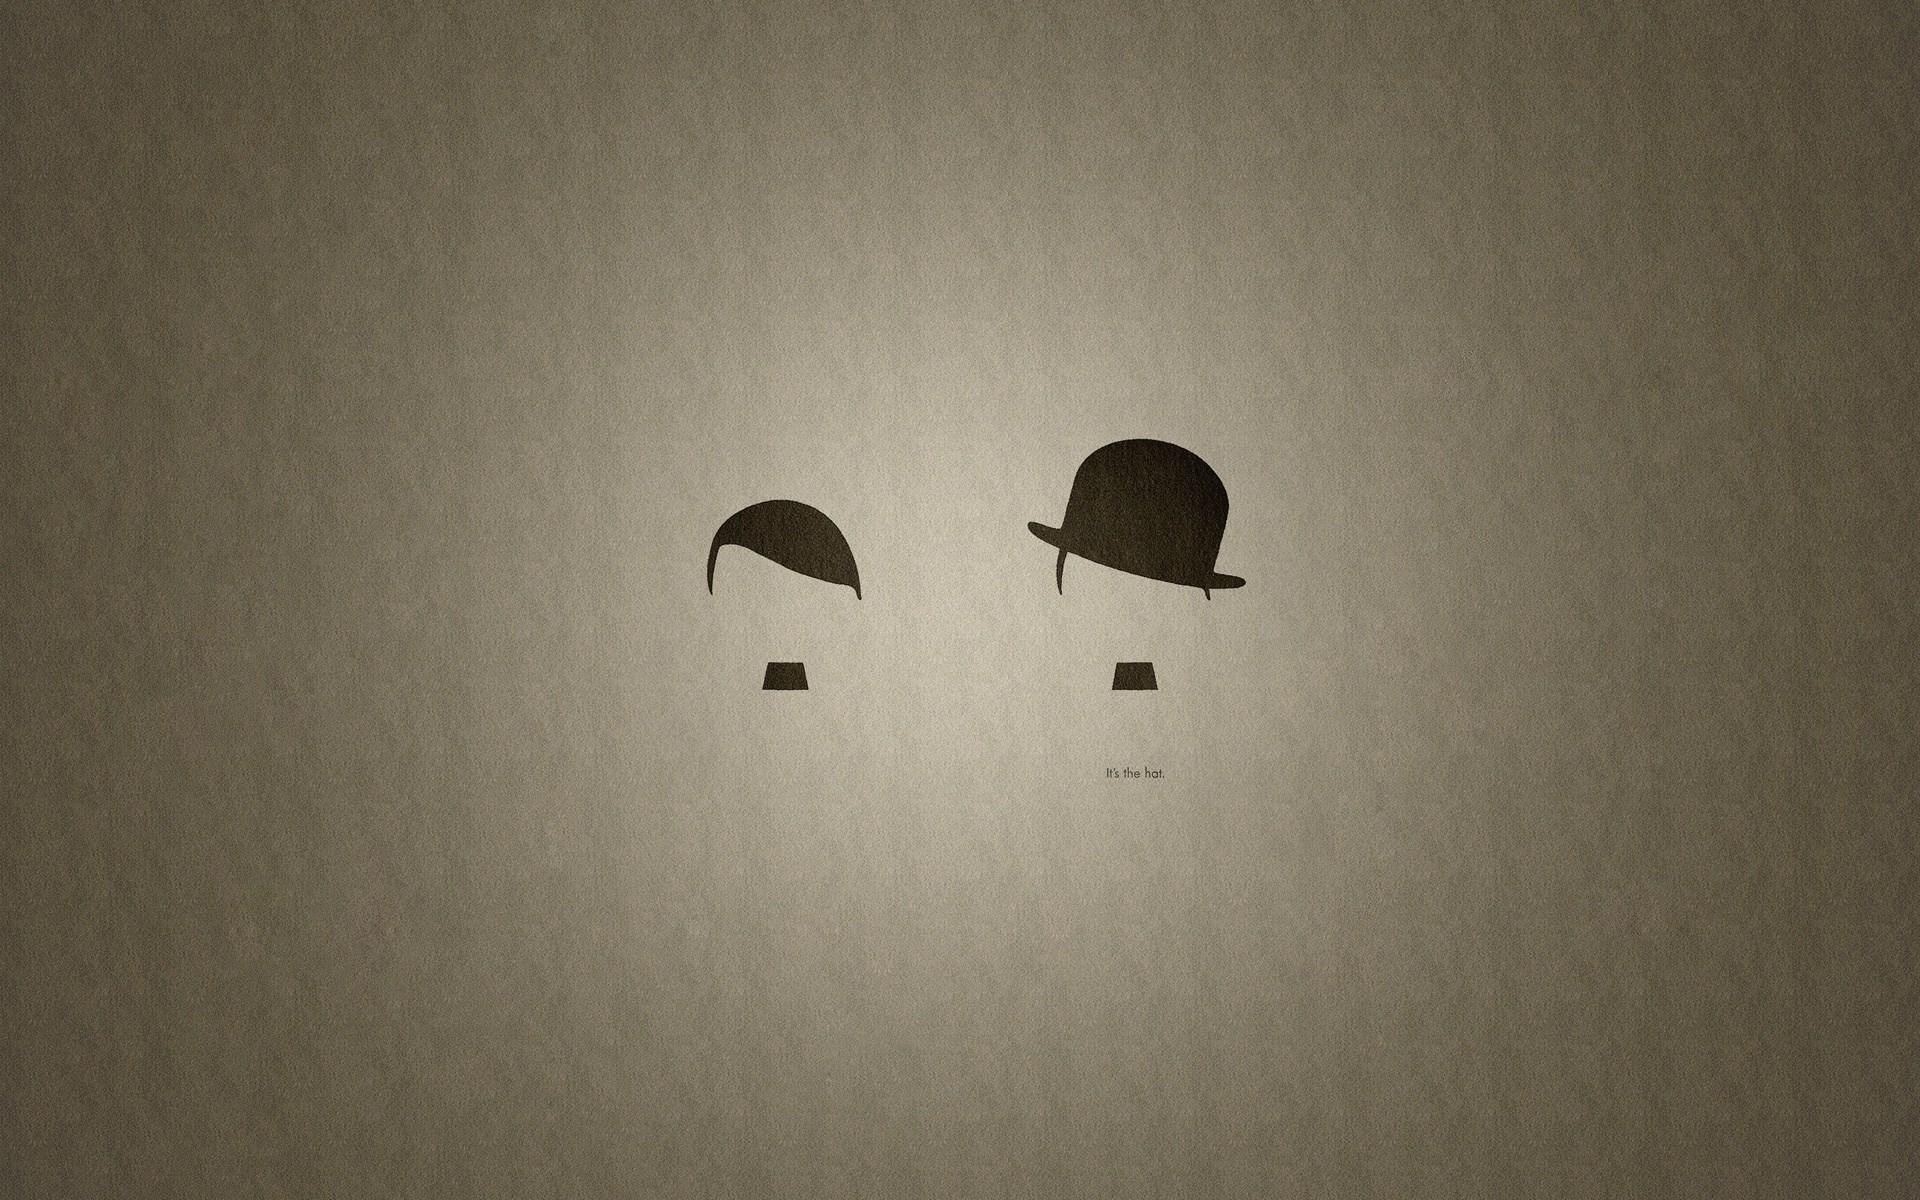 Charlie Chaplin Adolf Hitler Humor